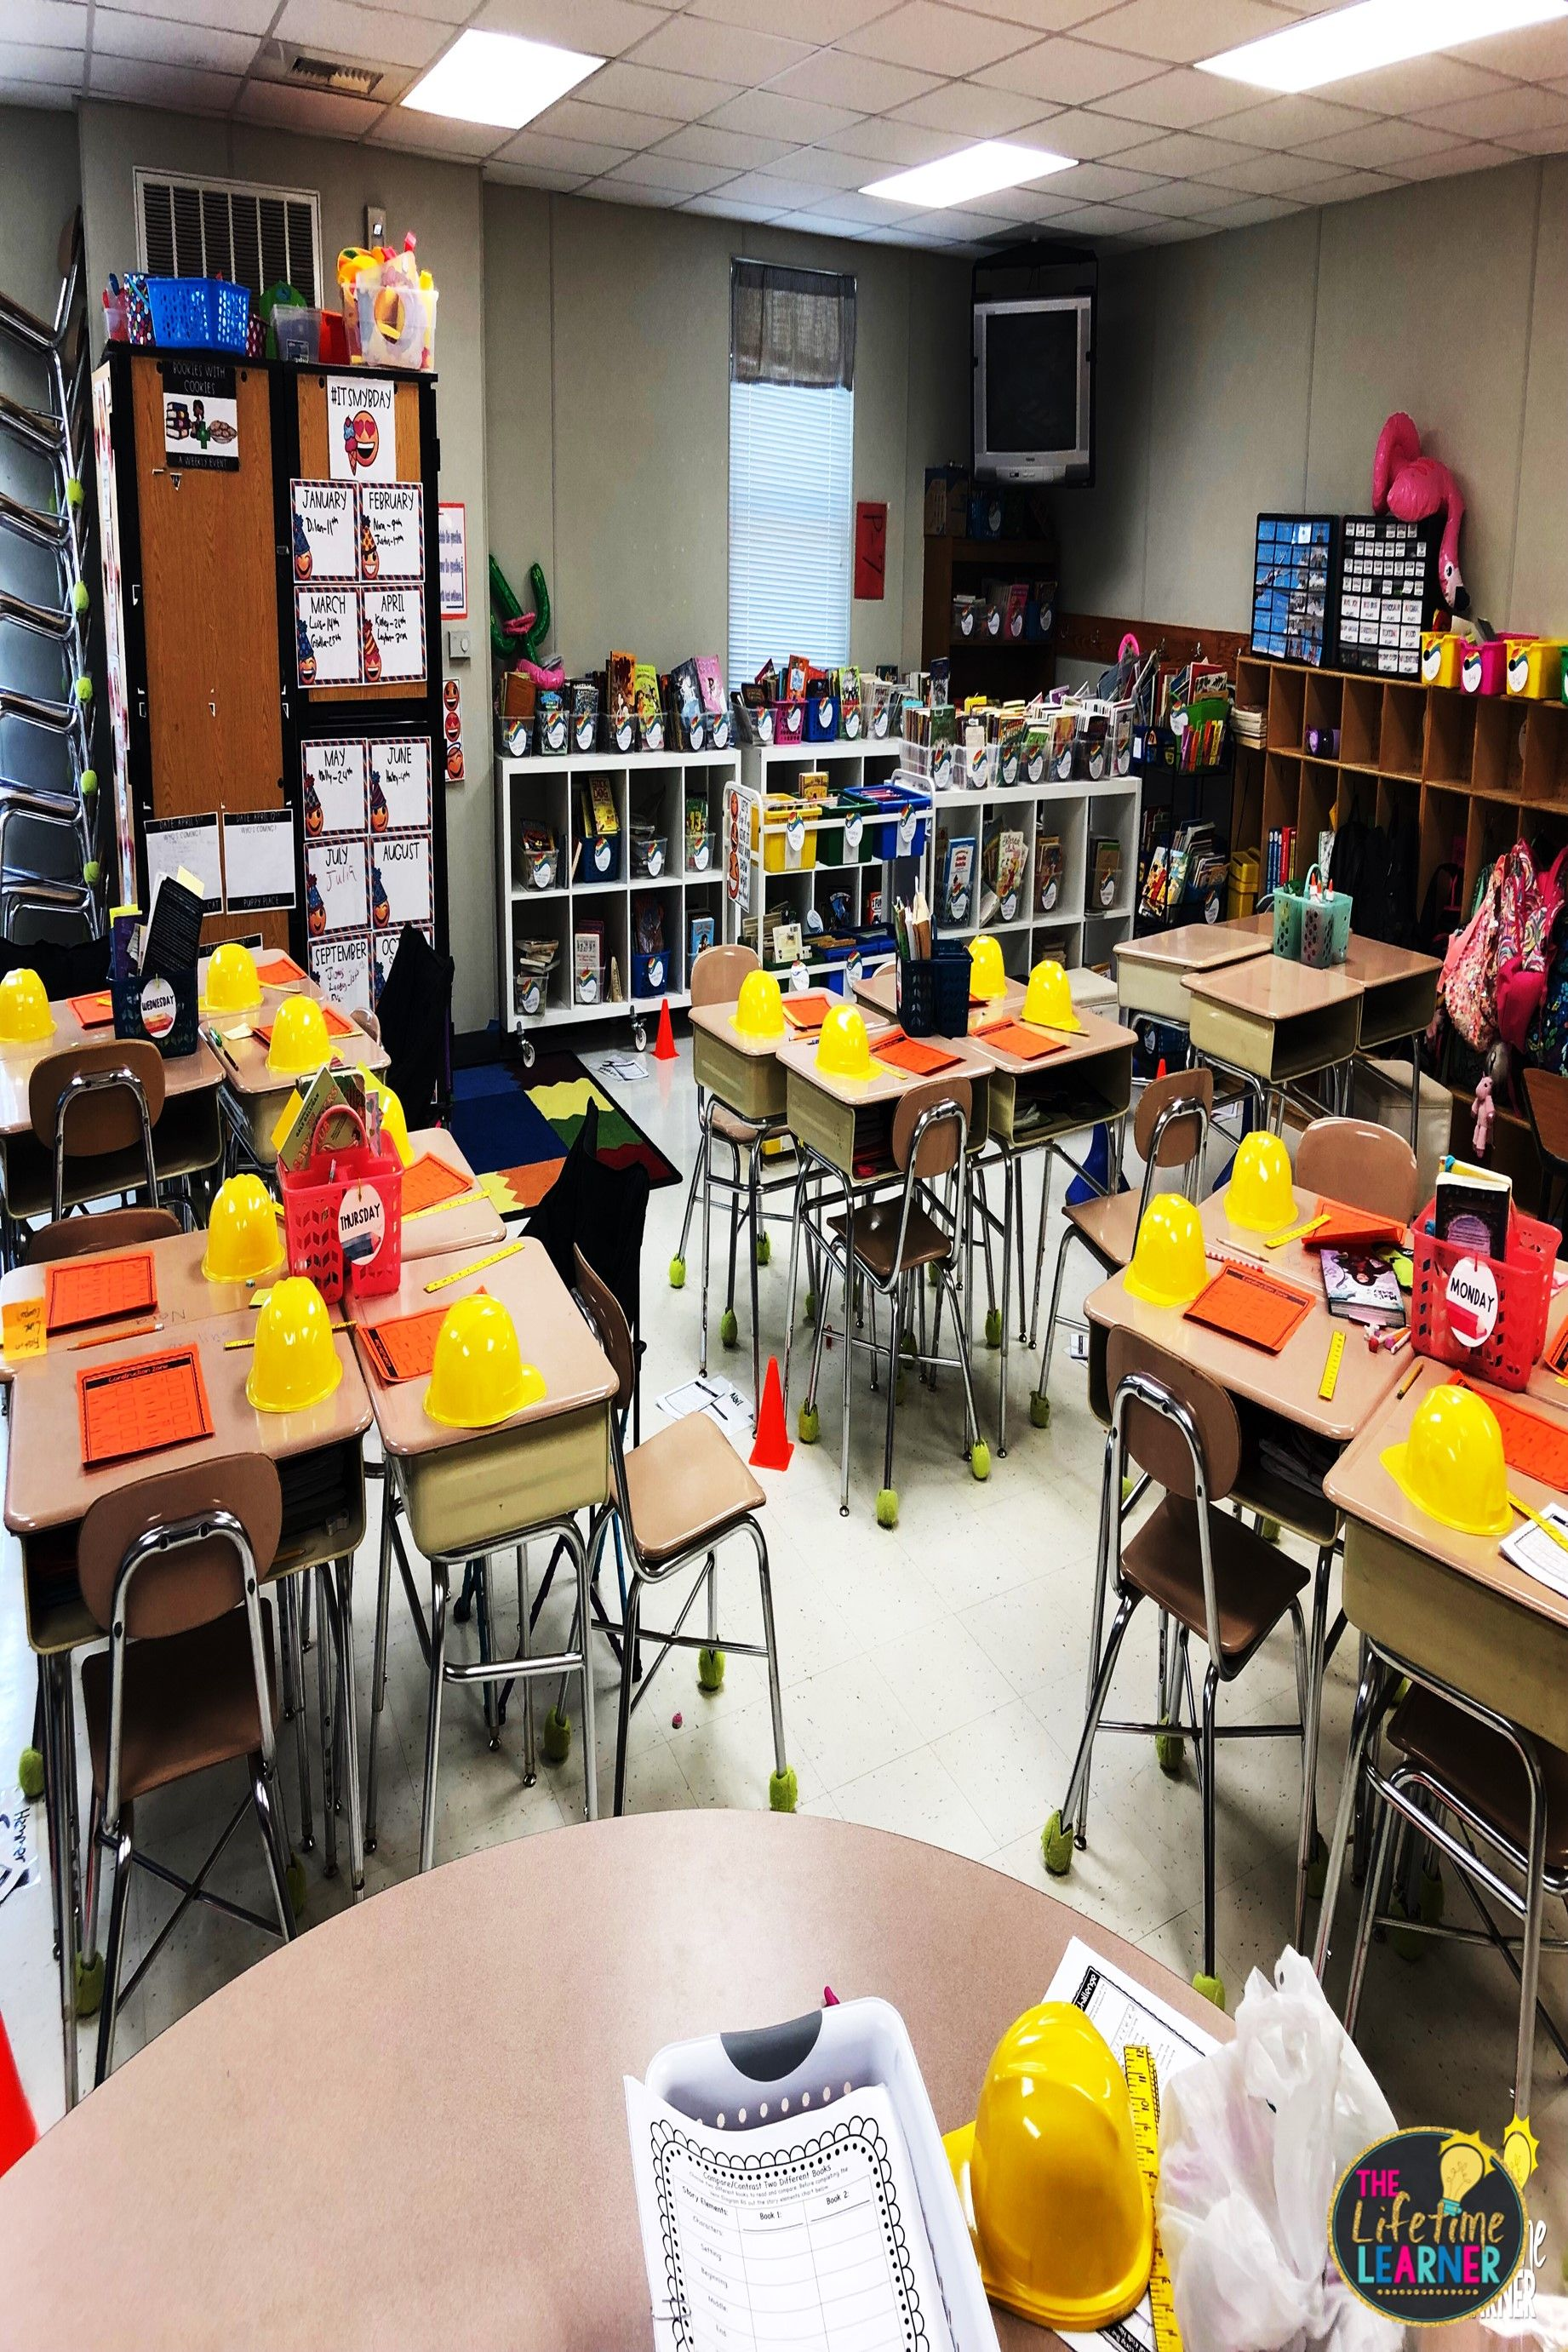 Check Out This Fun Construction Shop Classroom